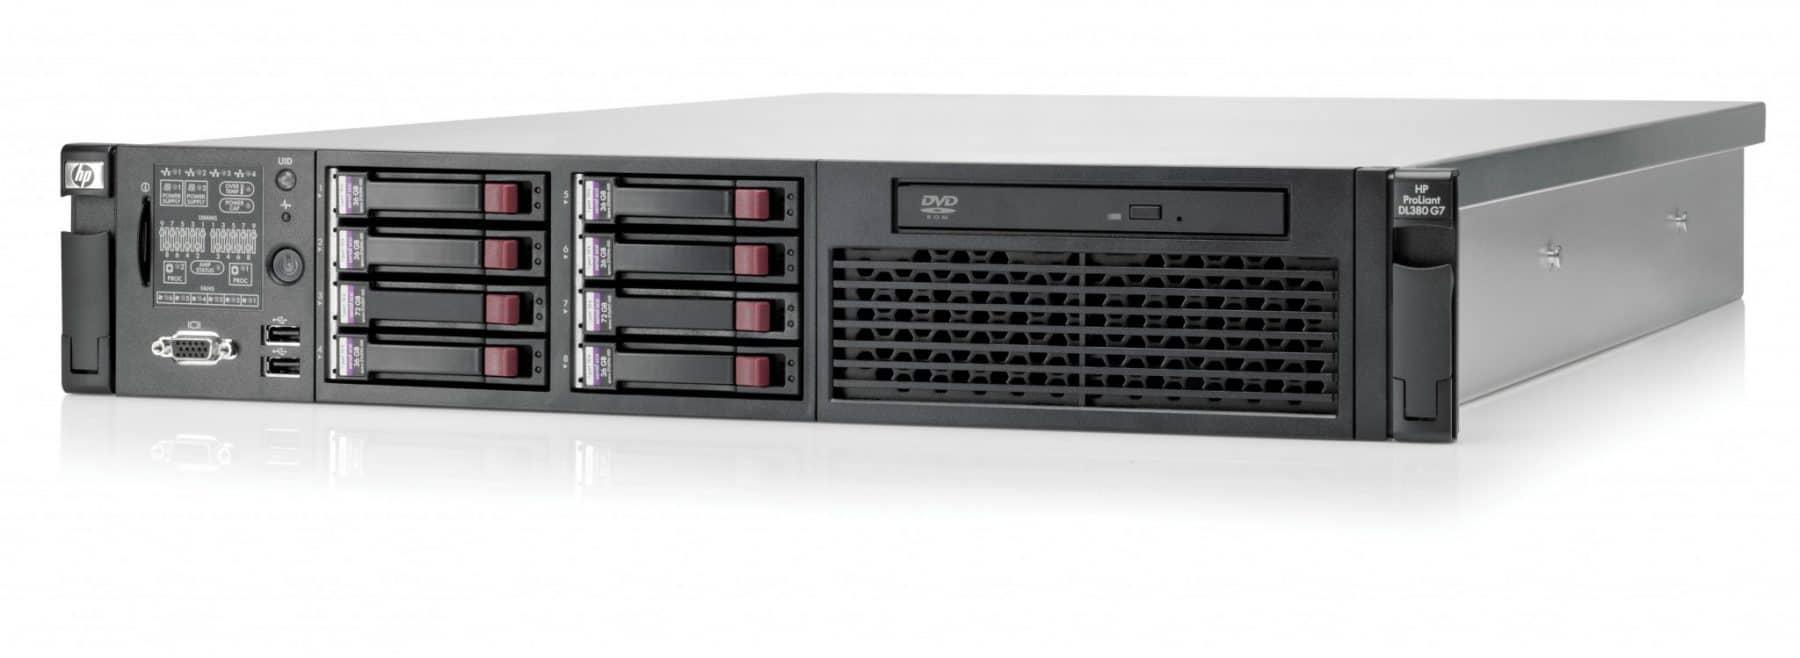 HP-Proliant-DL380-G7-Server-Front-View-2-1-2-2-3-1-3-1-1.jpe